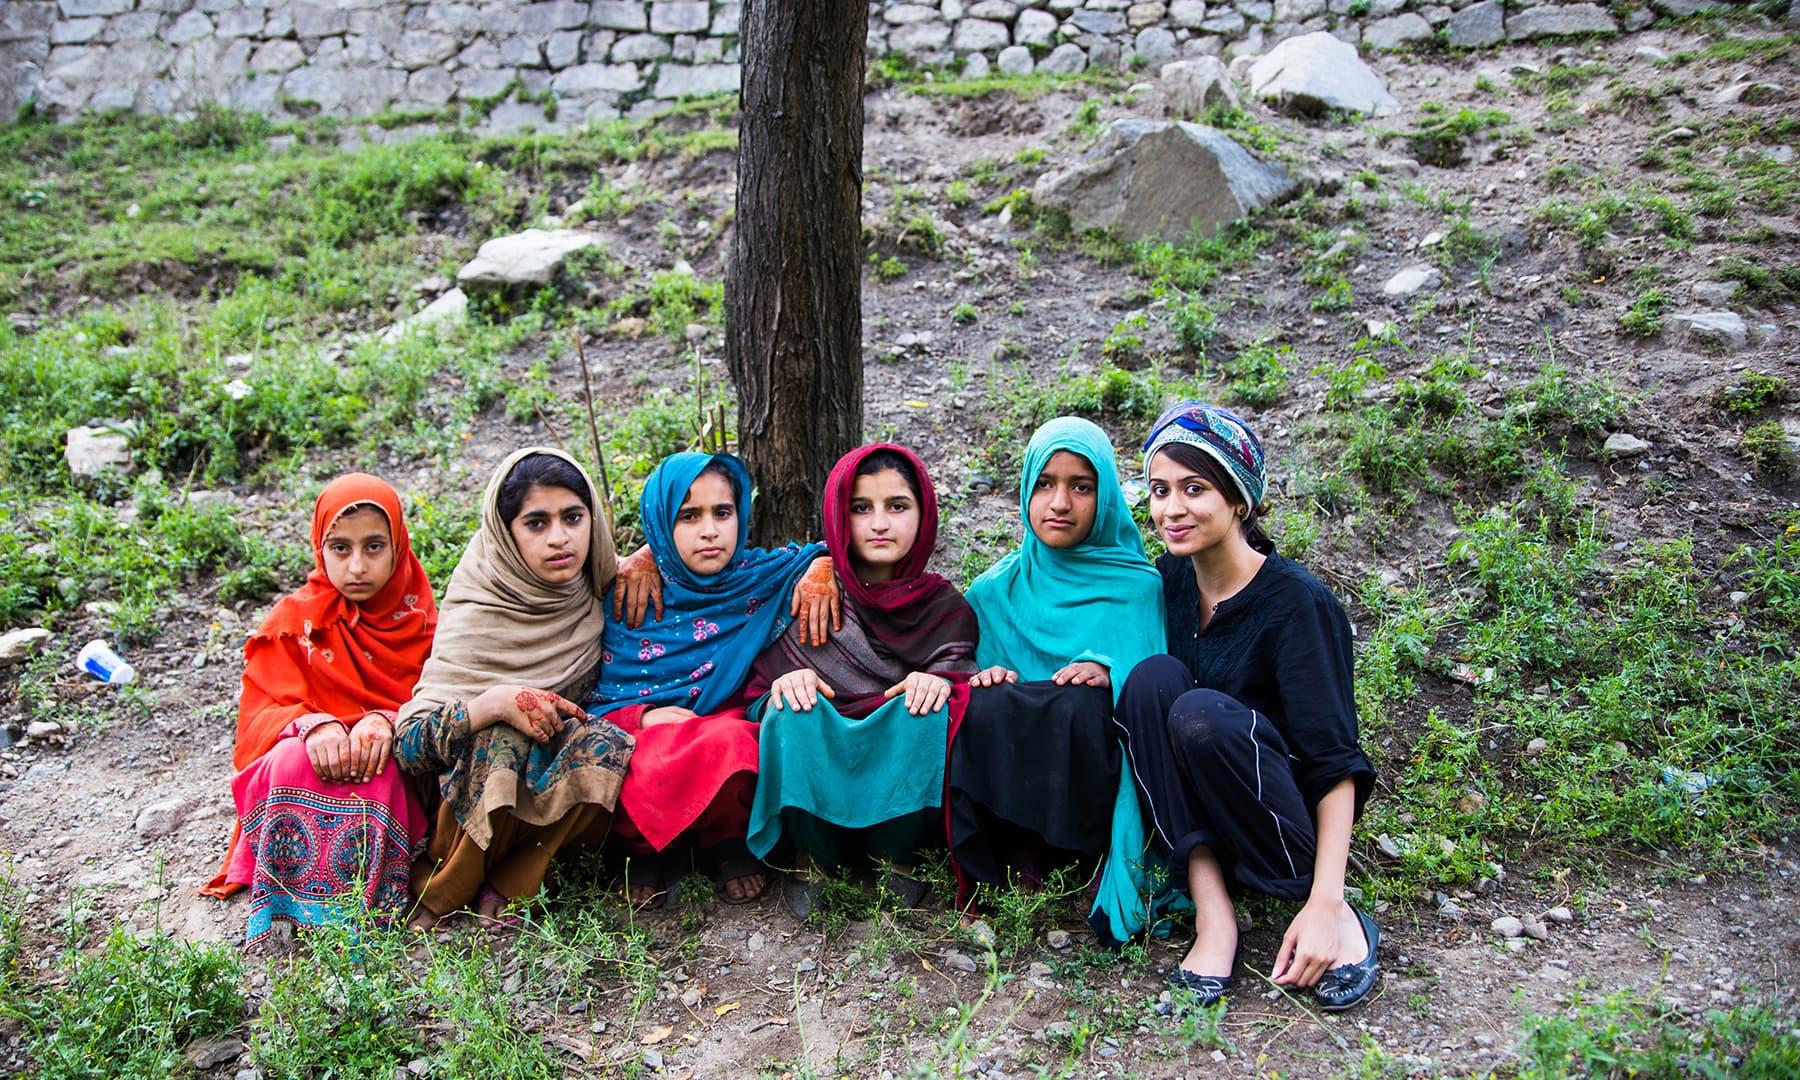 With the local schoolgirls. —Marvi Soomro